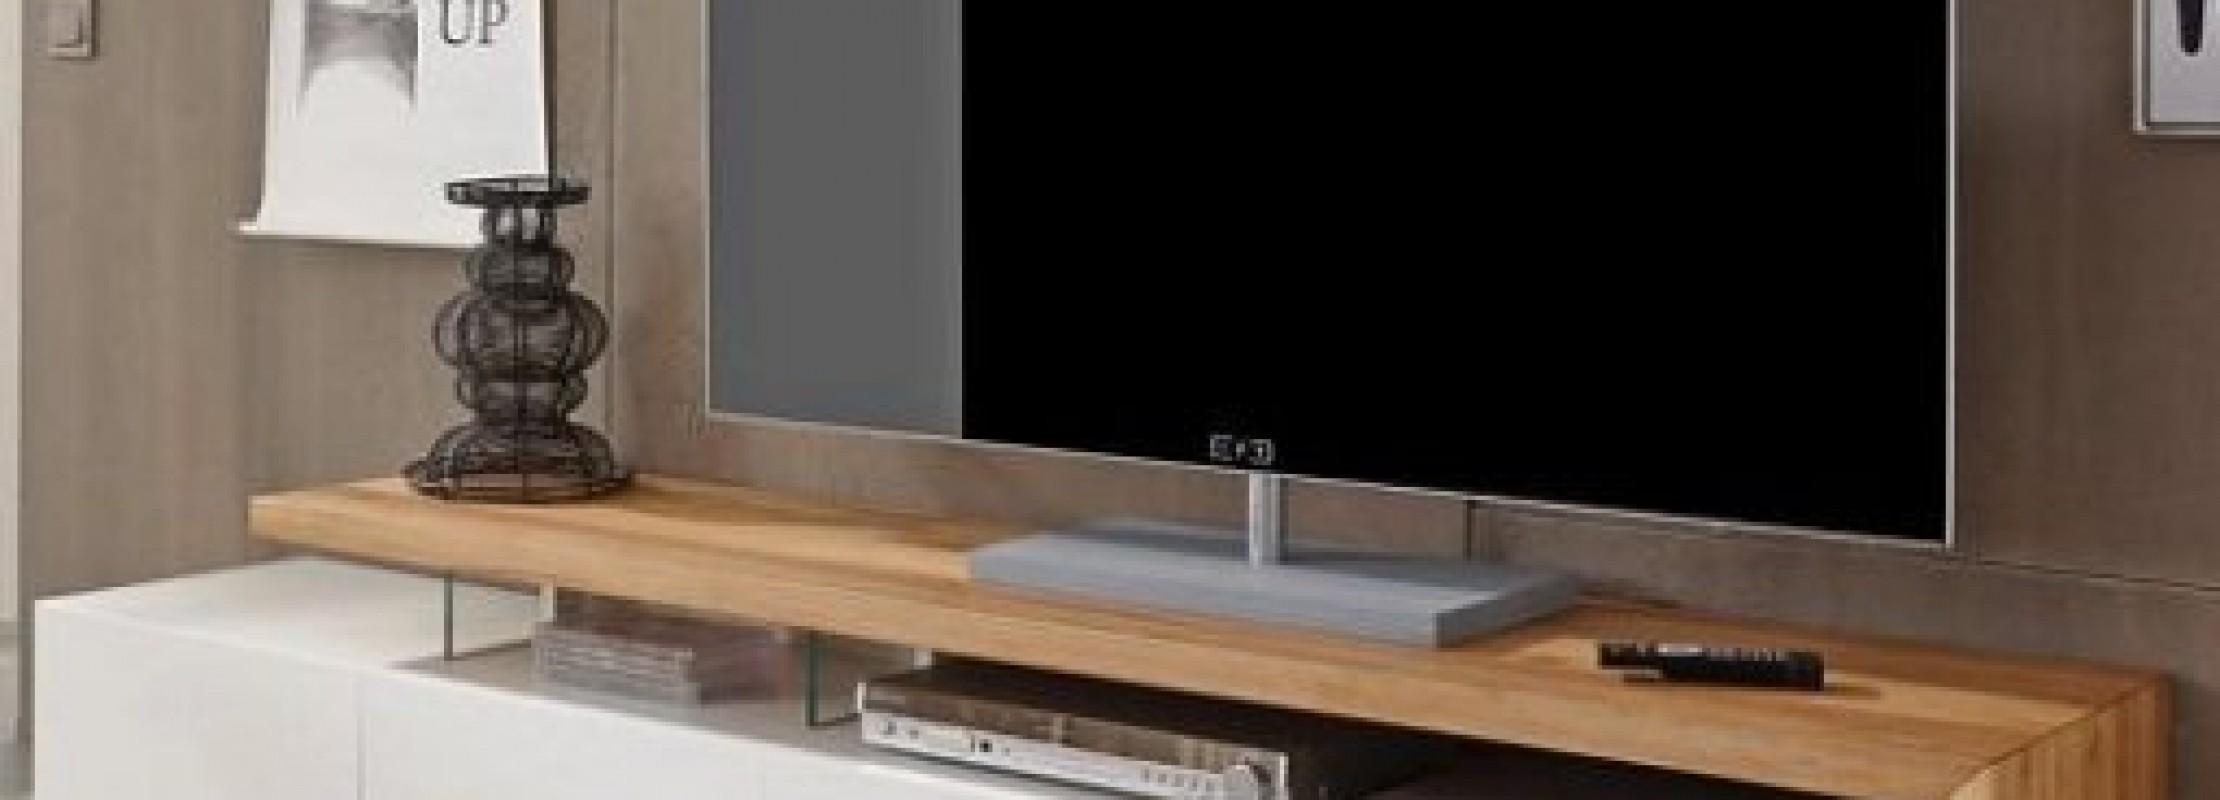 Arredamento Mobile Porta Tv.Mobile Porta Tv Blog Edilnet